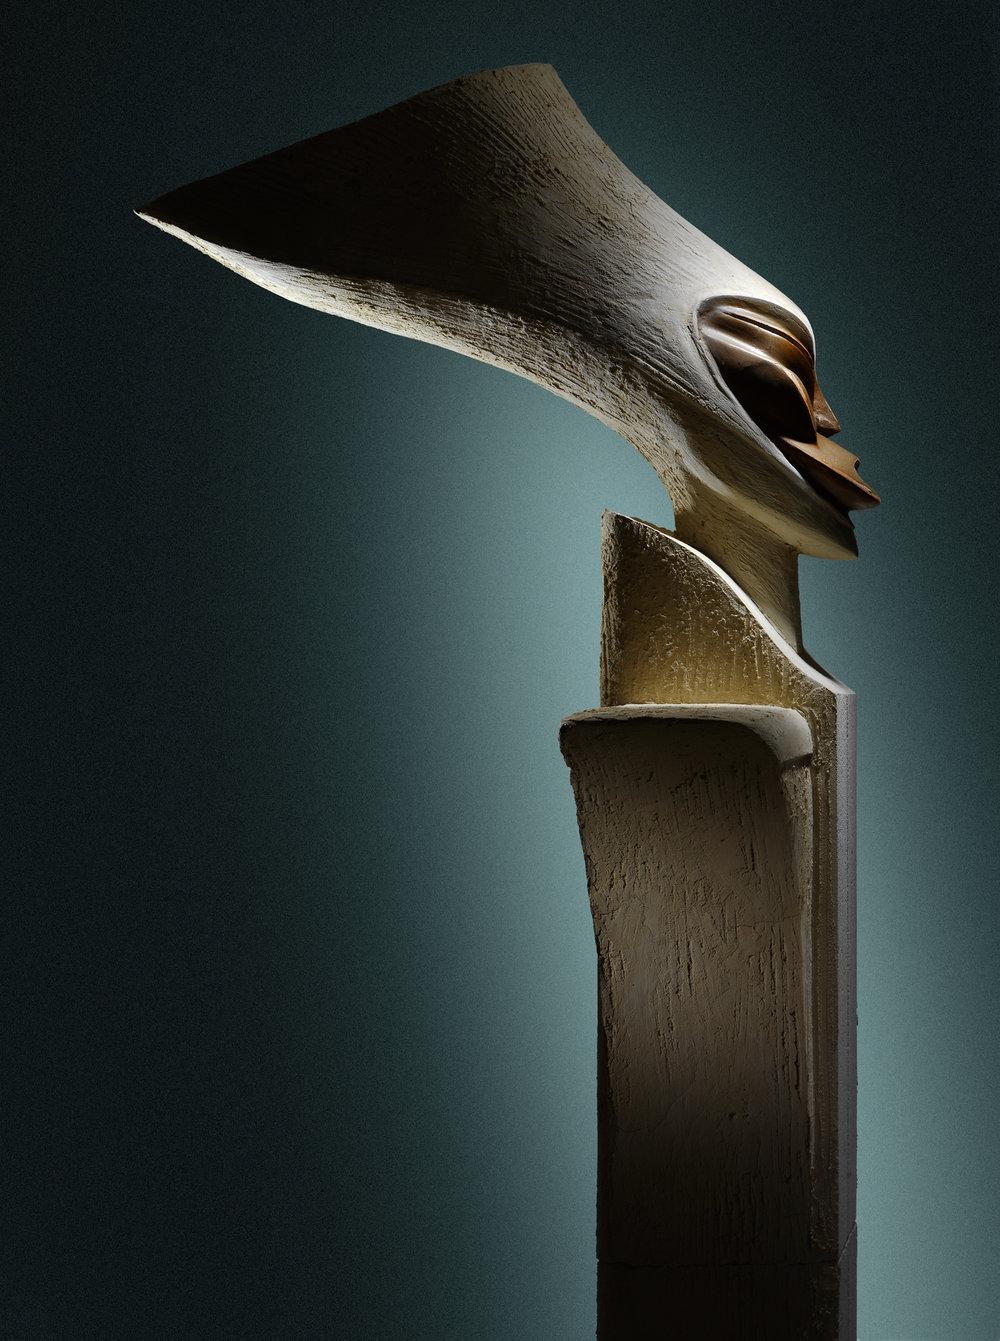 Maurice Kennel, Sculptur, Still Life, Fotograf Zürich, Schweiz